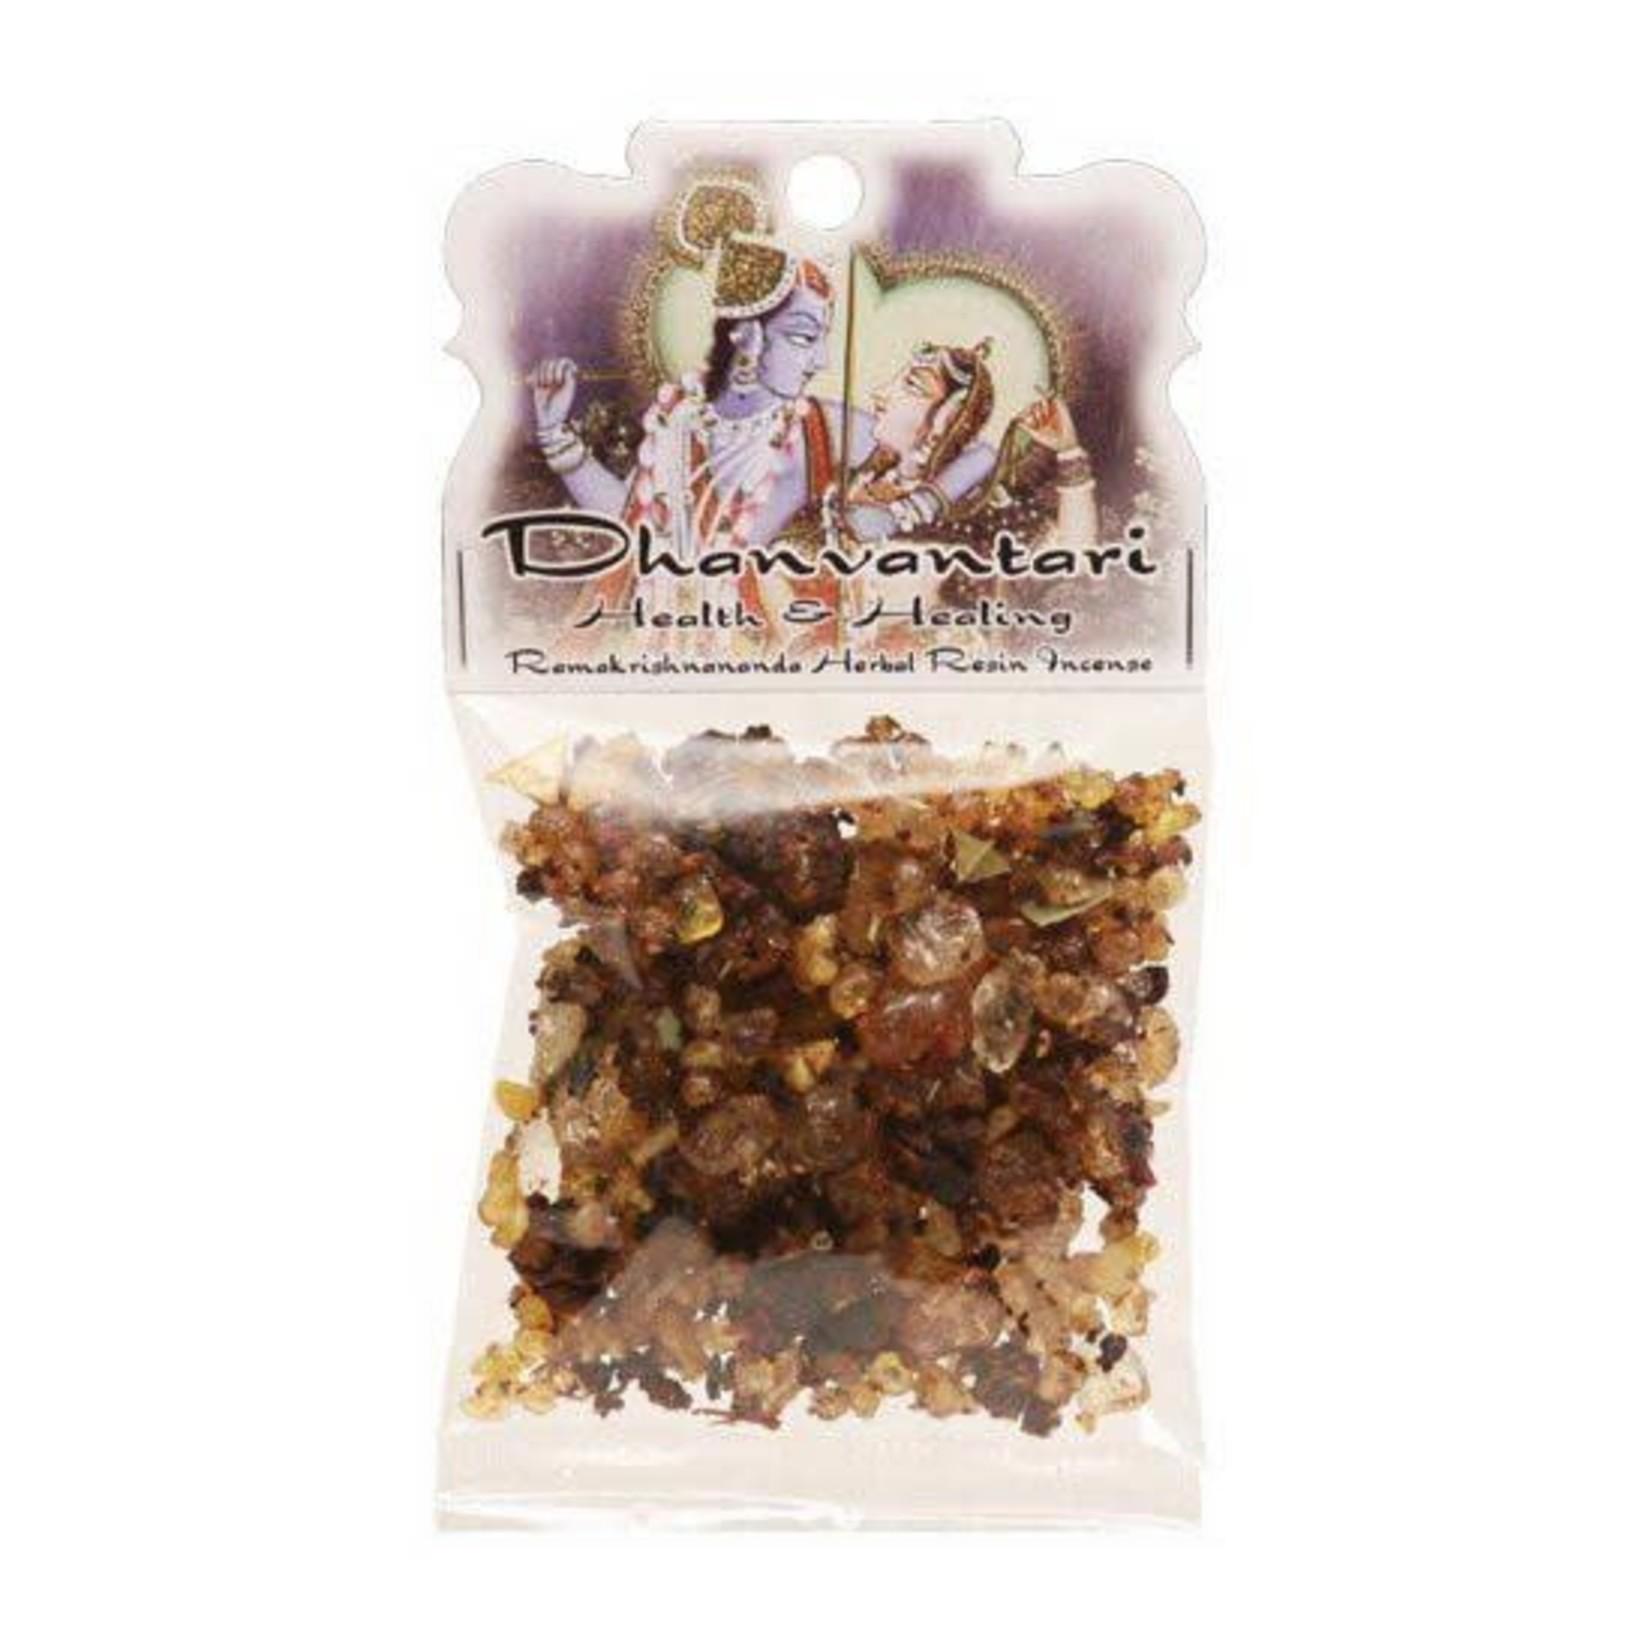 Prabhujis Gifts Dhanvantari - Health and Healing Resin Incense